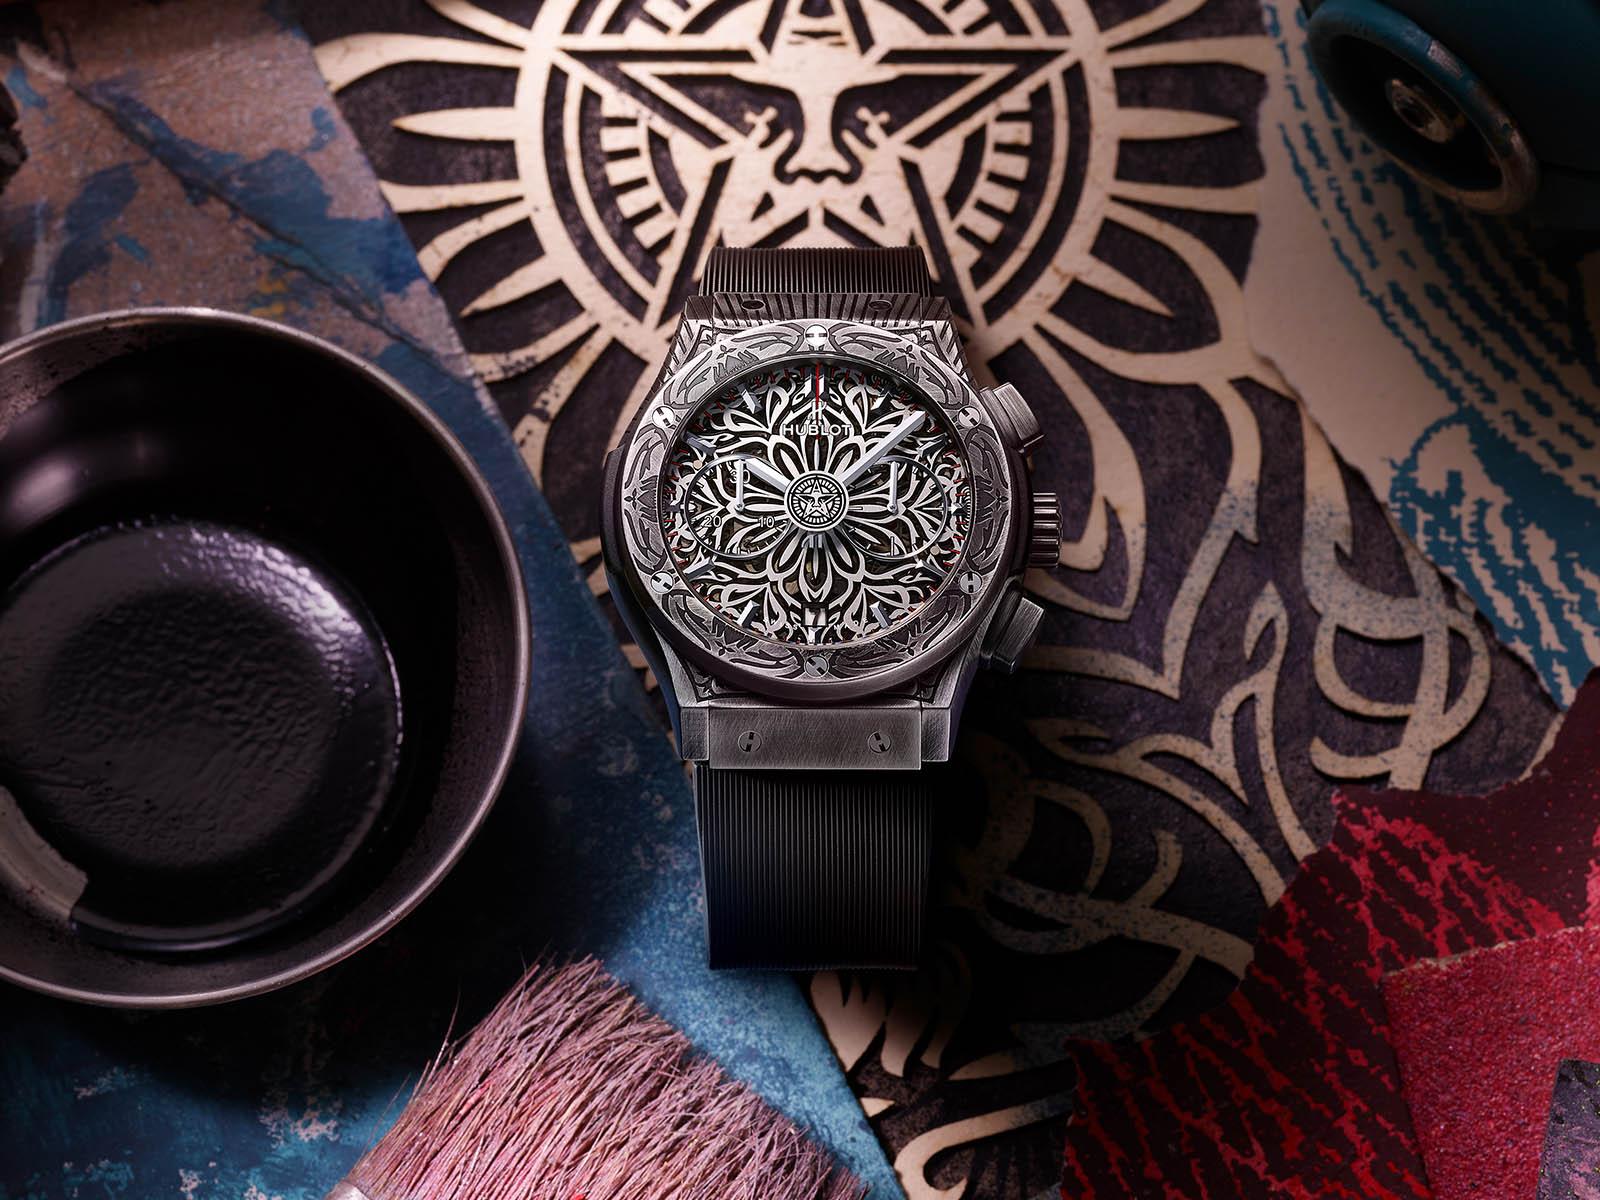 525-nx-0137-rx-shf21-hublot-classic-fusion-chronograph-shepard-fairey-2.jpg